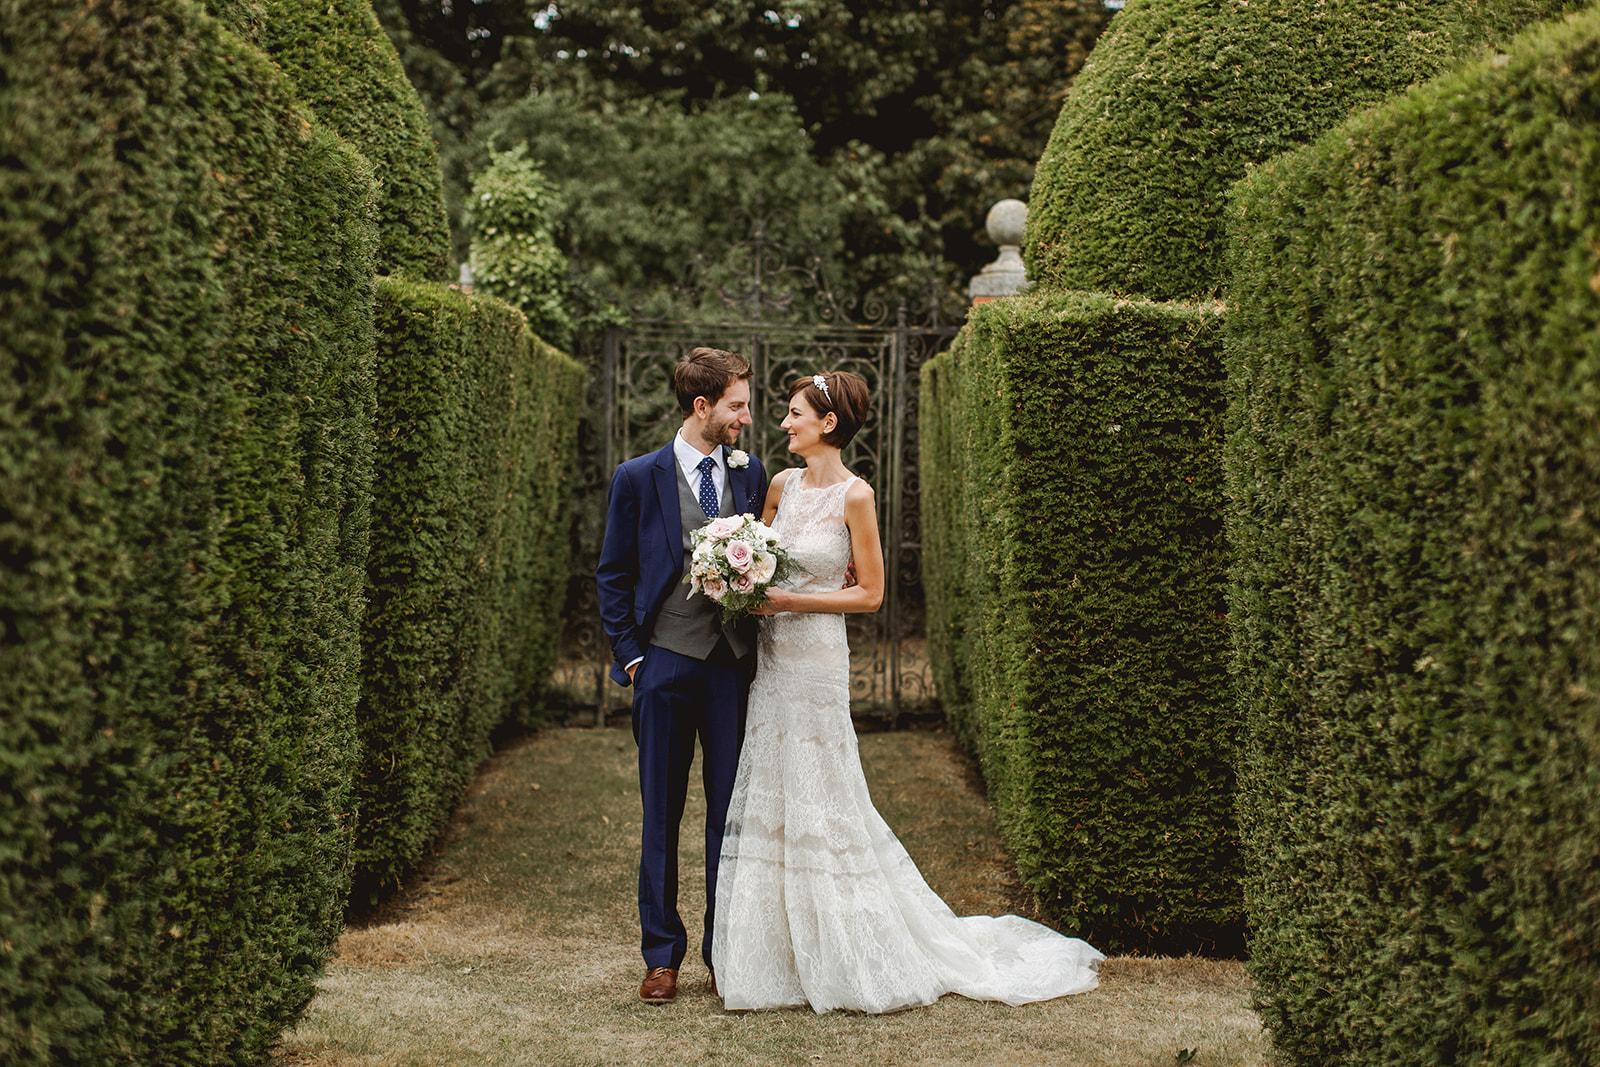 Eggington House marquee wedding_couple portrait